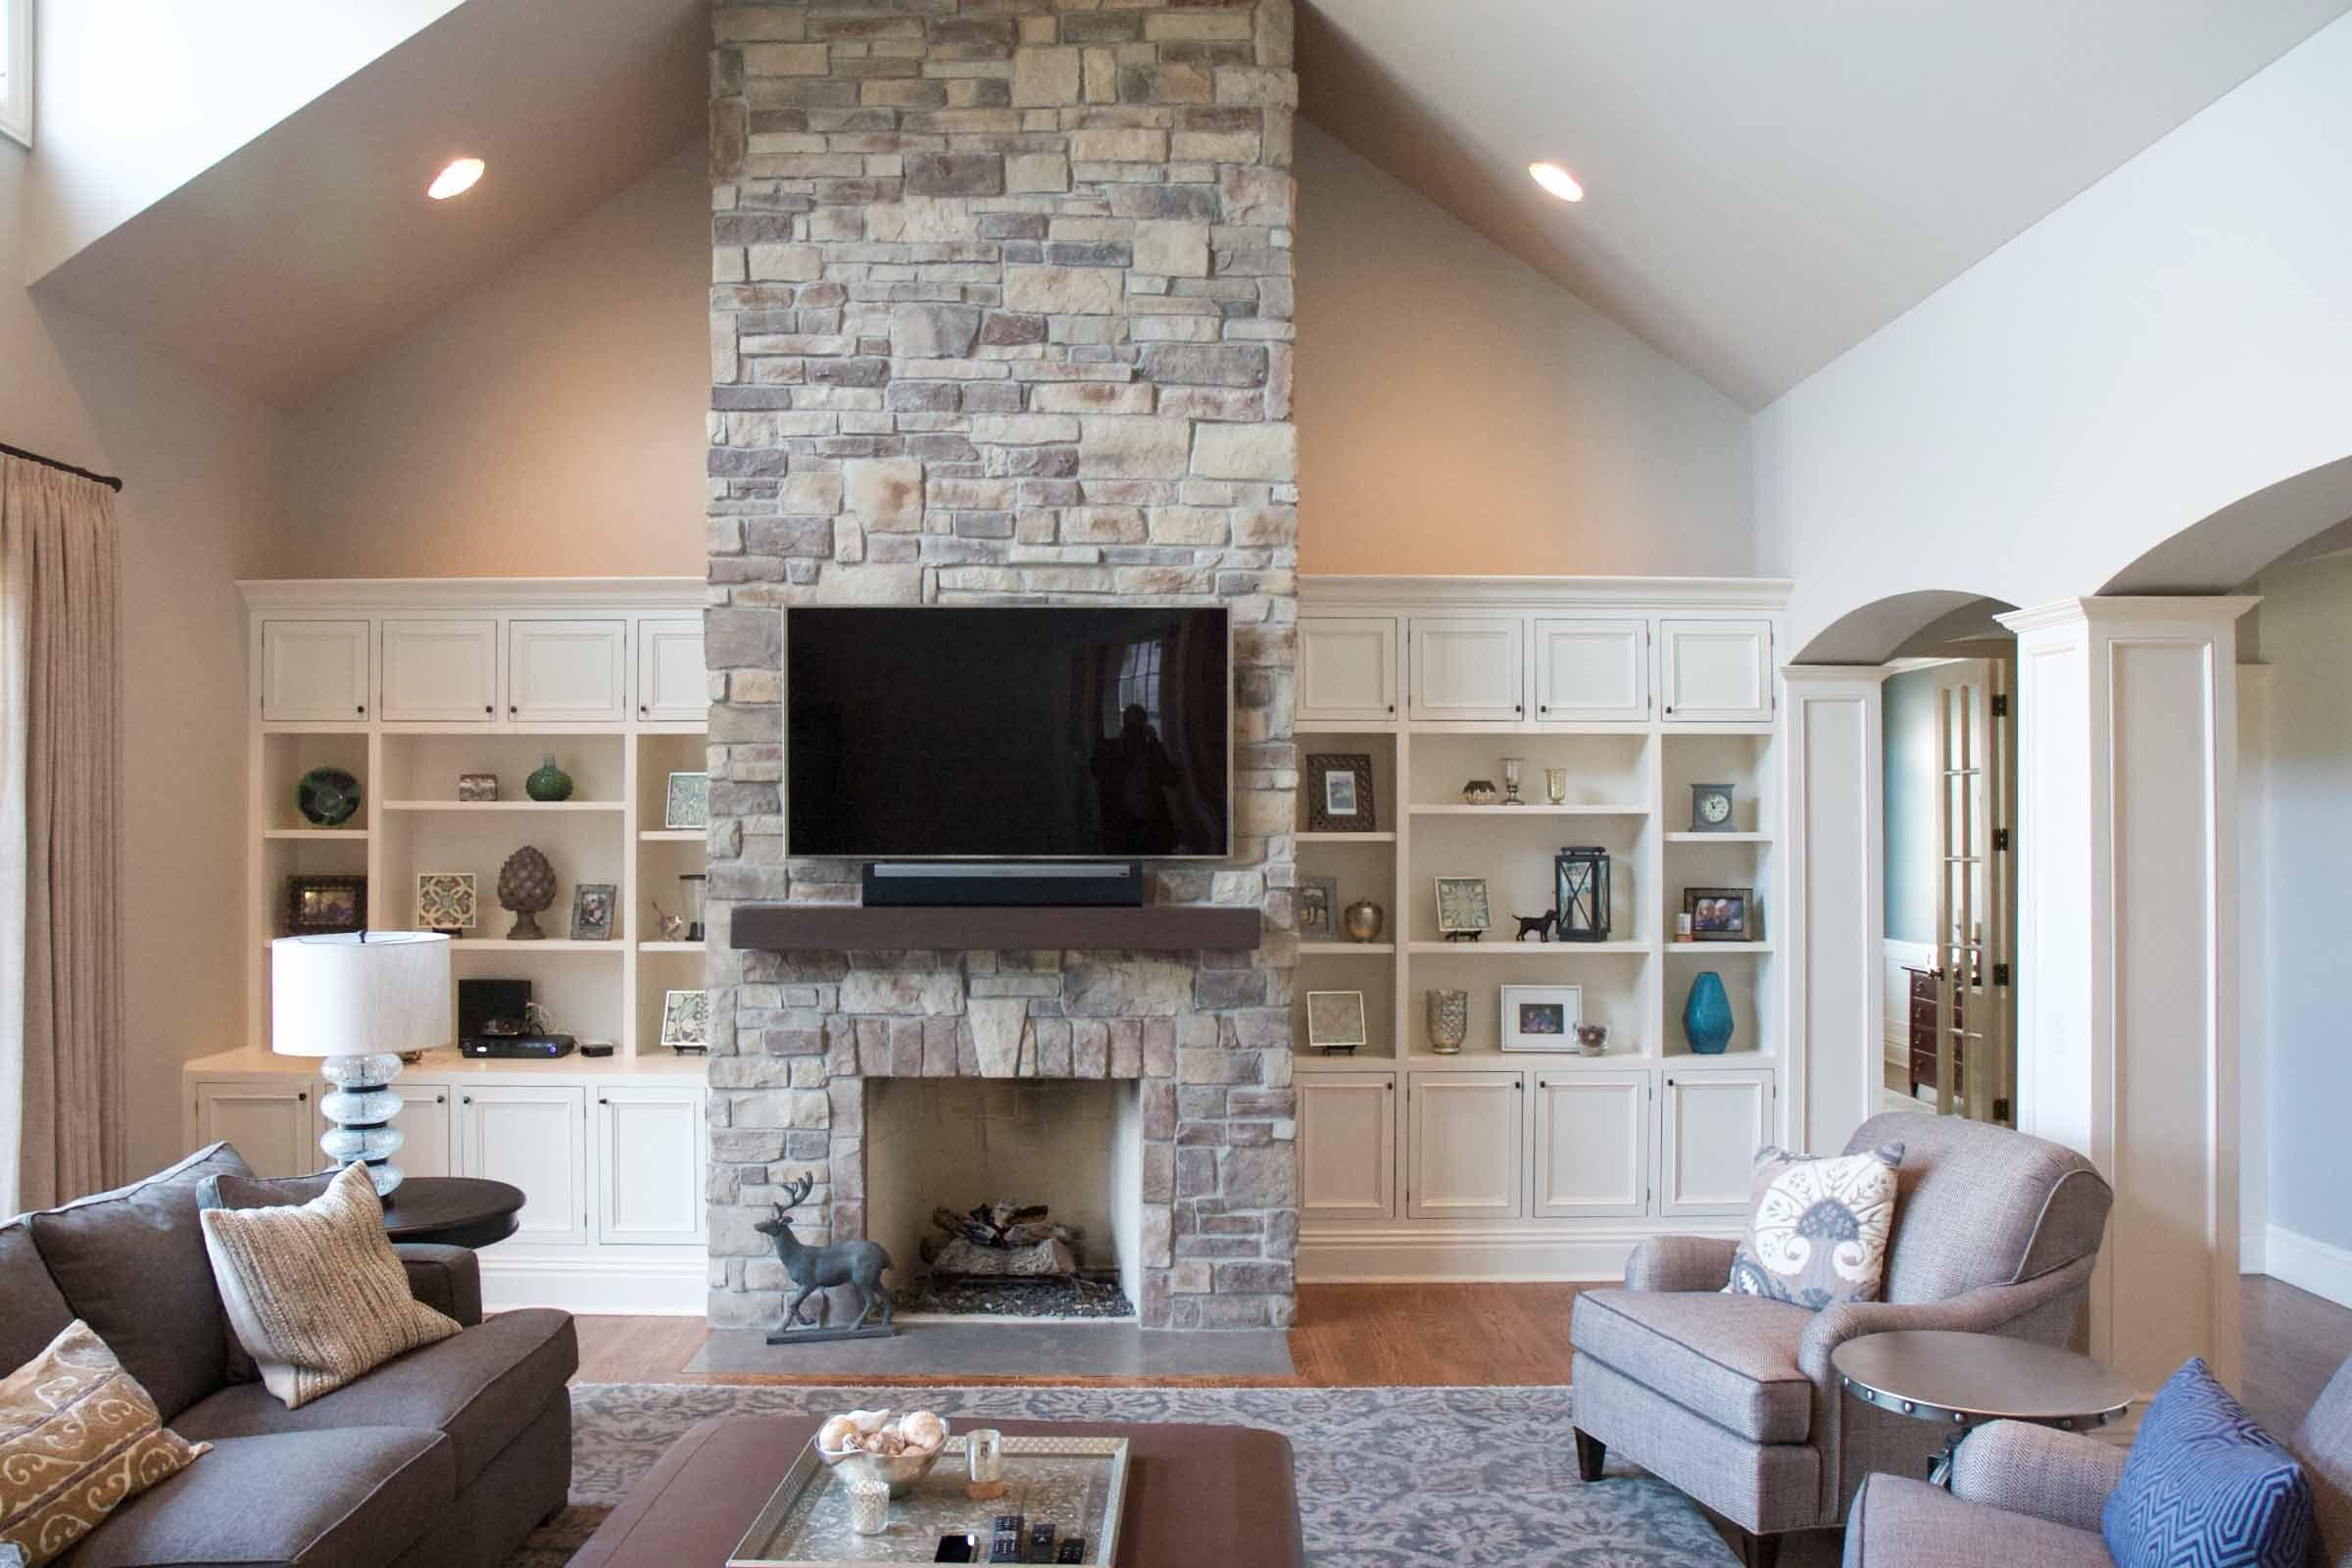 Pin By Latoya Wall On Living Room Stone Veneer Fireplace Stone Fireplace Designs Home Fireplace